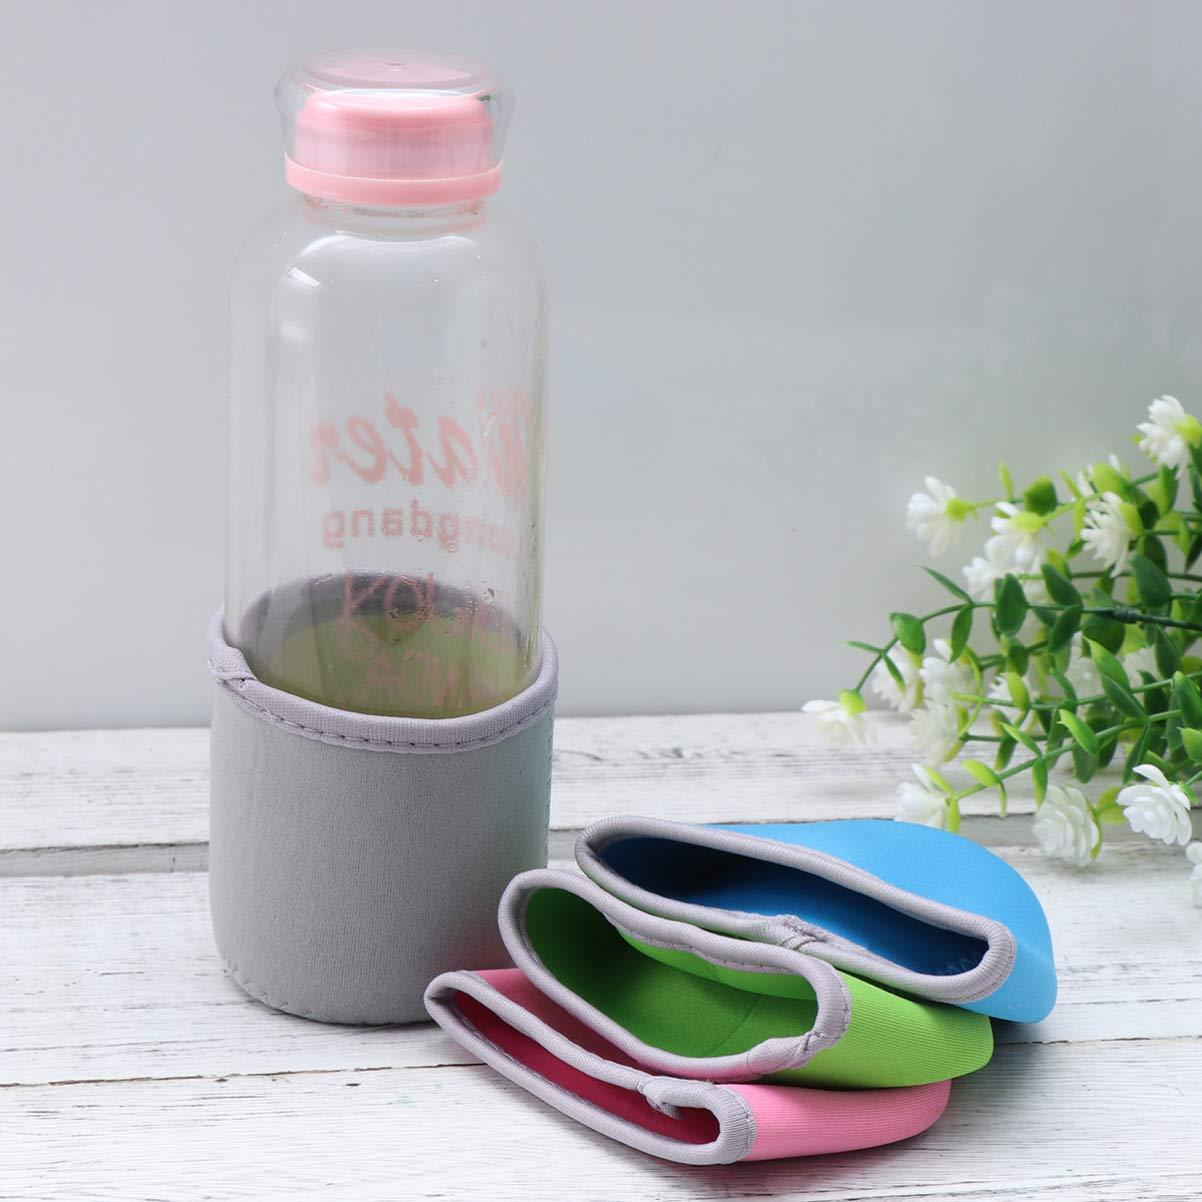 Random Color Hemoton Bottle Sleeve 10 pcs Bottle Bags Cup Holder Glass Covers Neoprene Reusable Insulated Pot-bellied Bottle Coat for Beach Camping Fishing 400ml